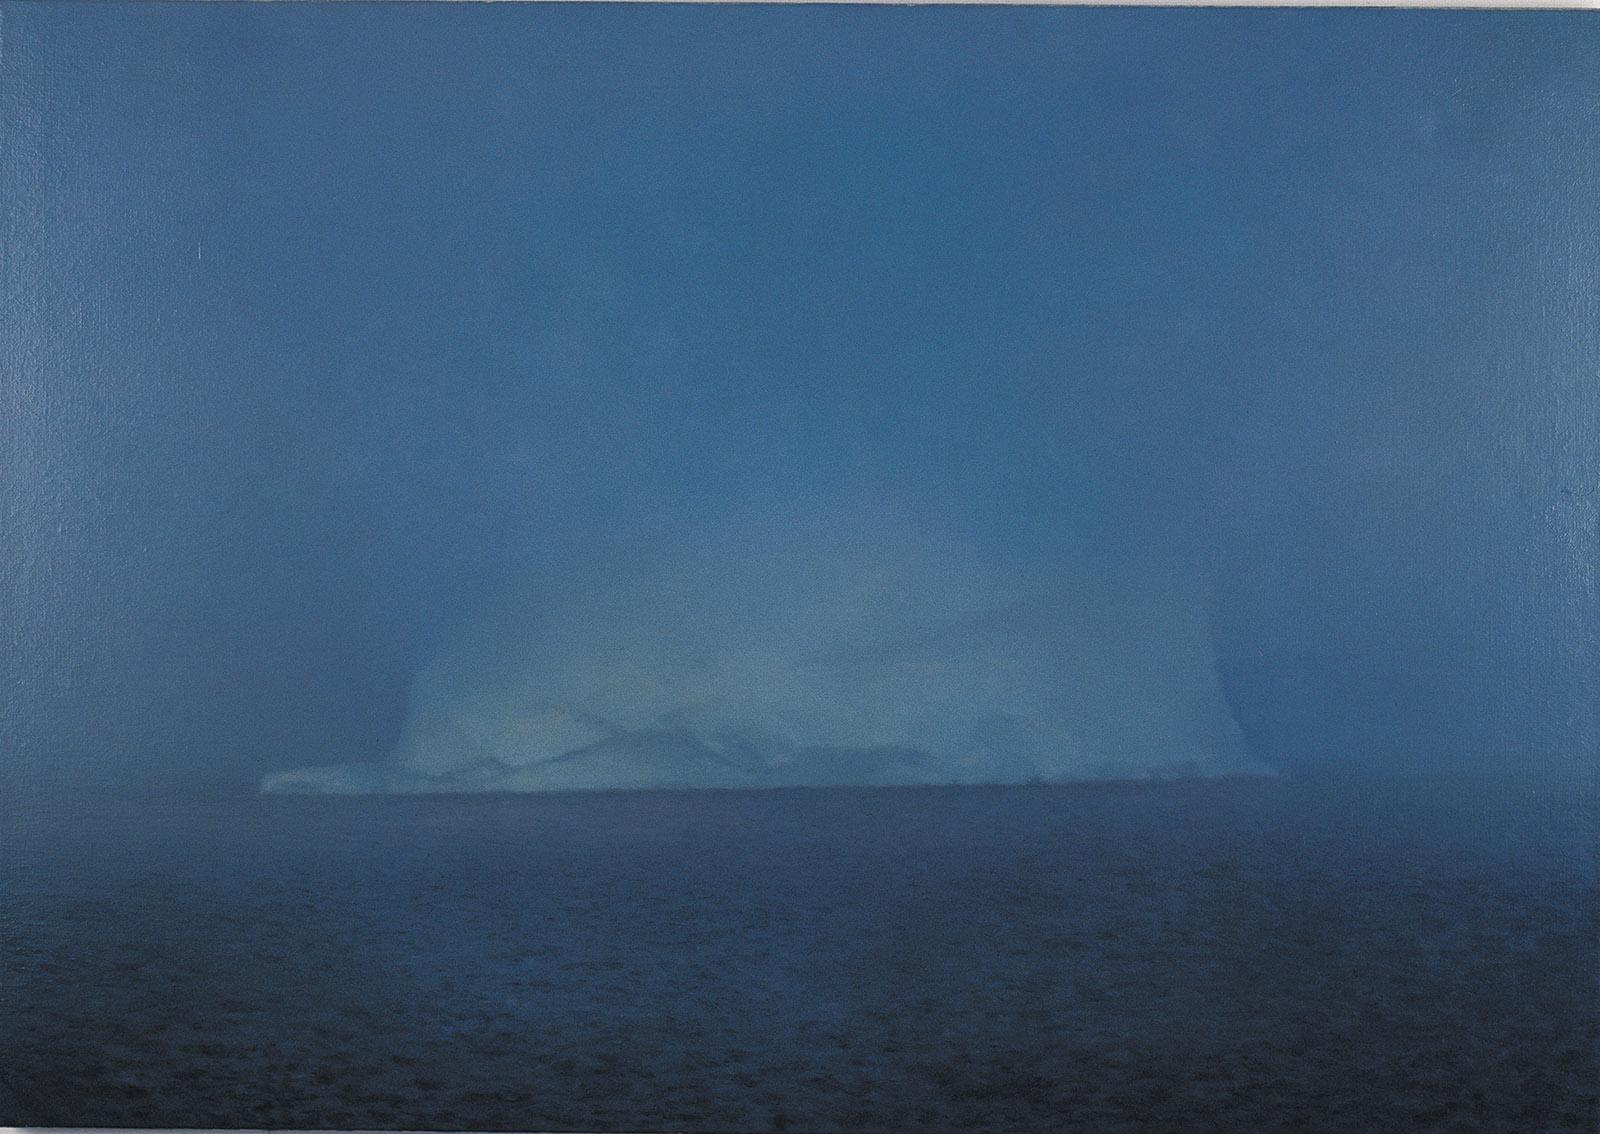 Iceberg in Mist; painting by Gerhard Richter